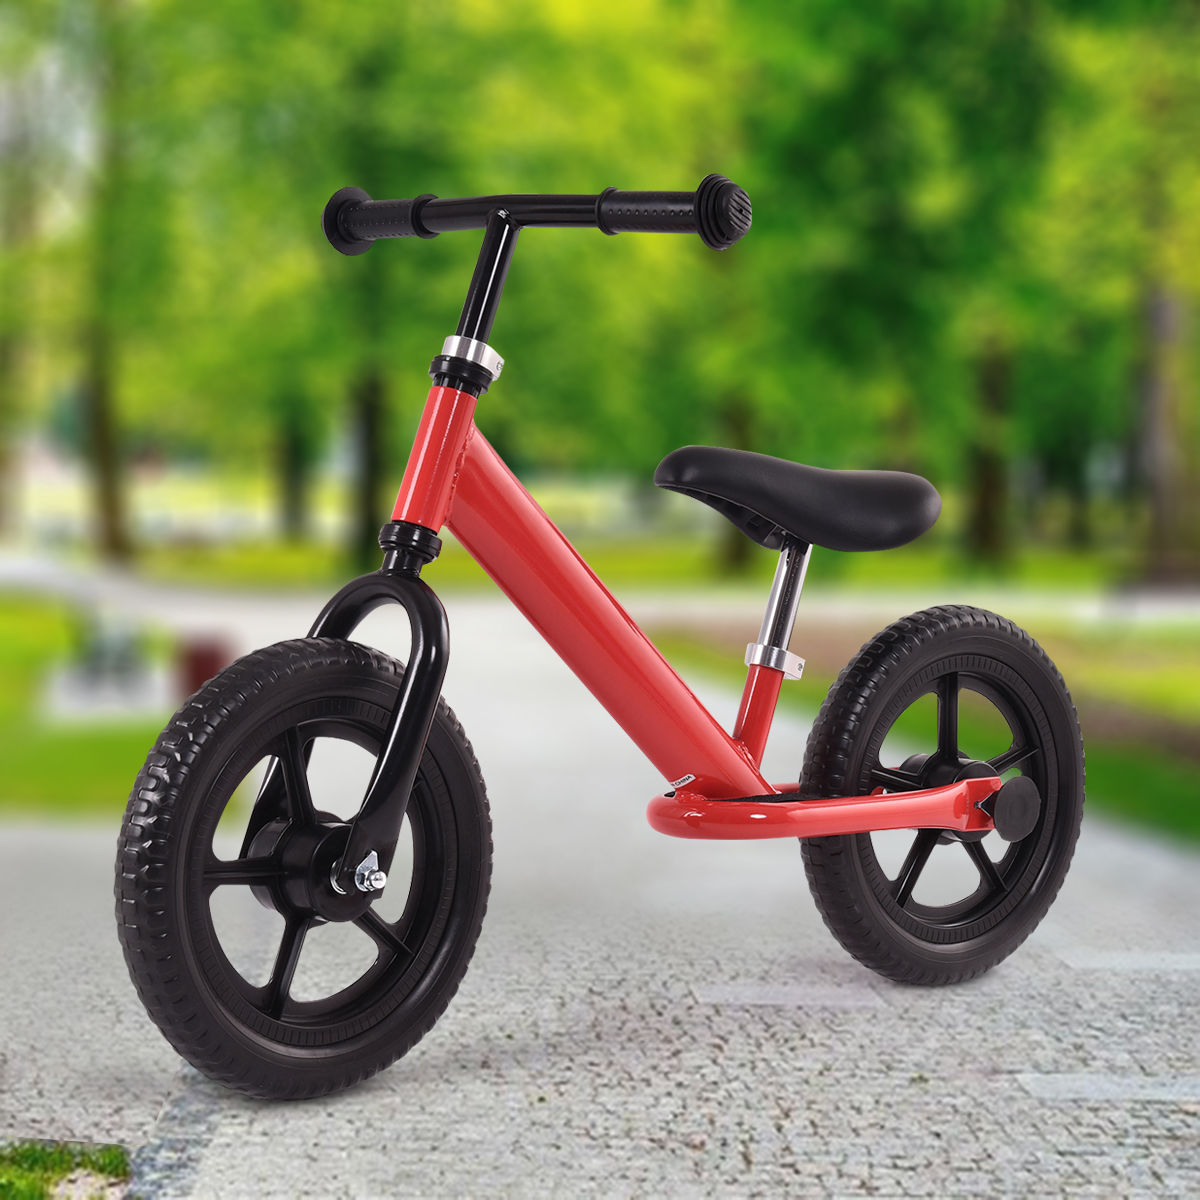 "GHP Red 12"" Wheel Foam Tire 66Lbs Capacity Kids Balance Bike with Adjustable Seat"